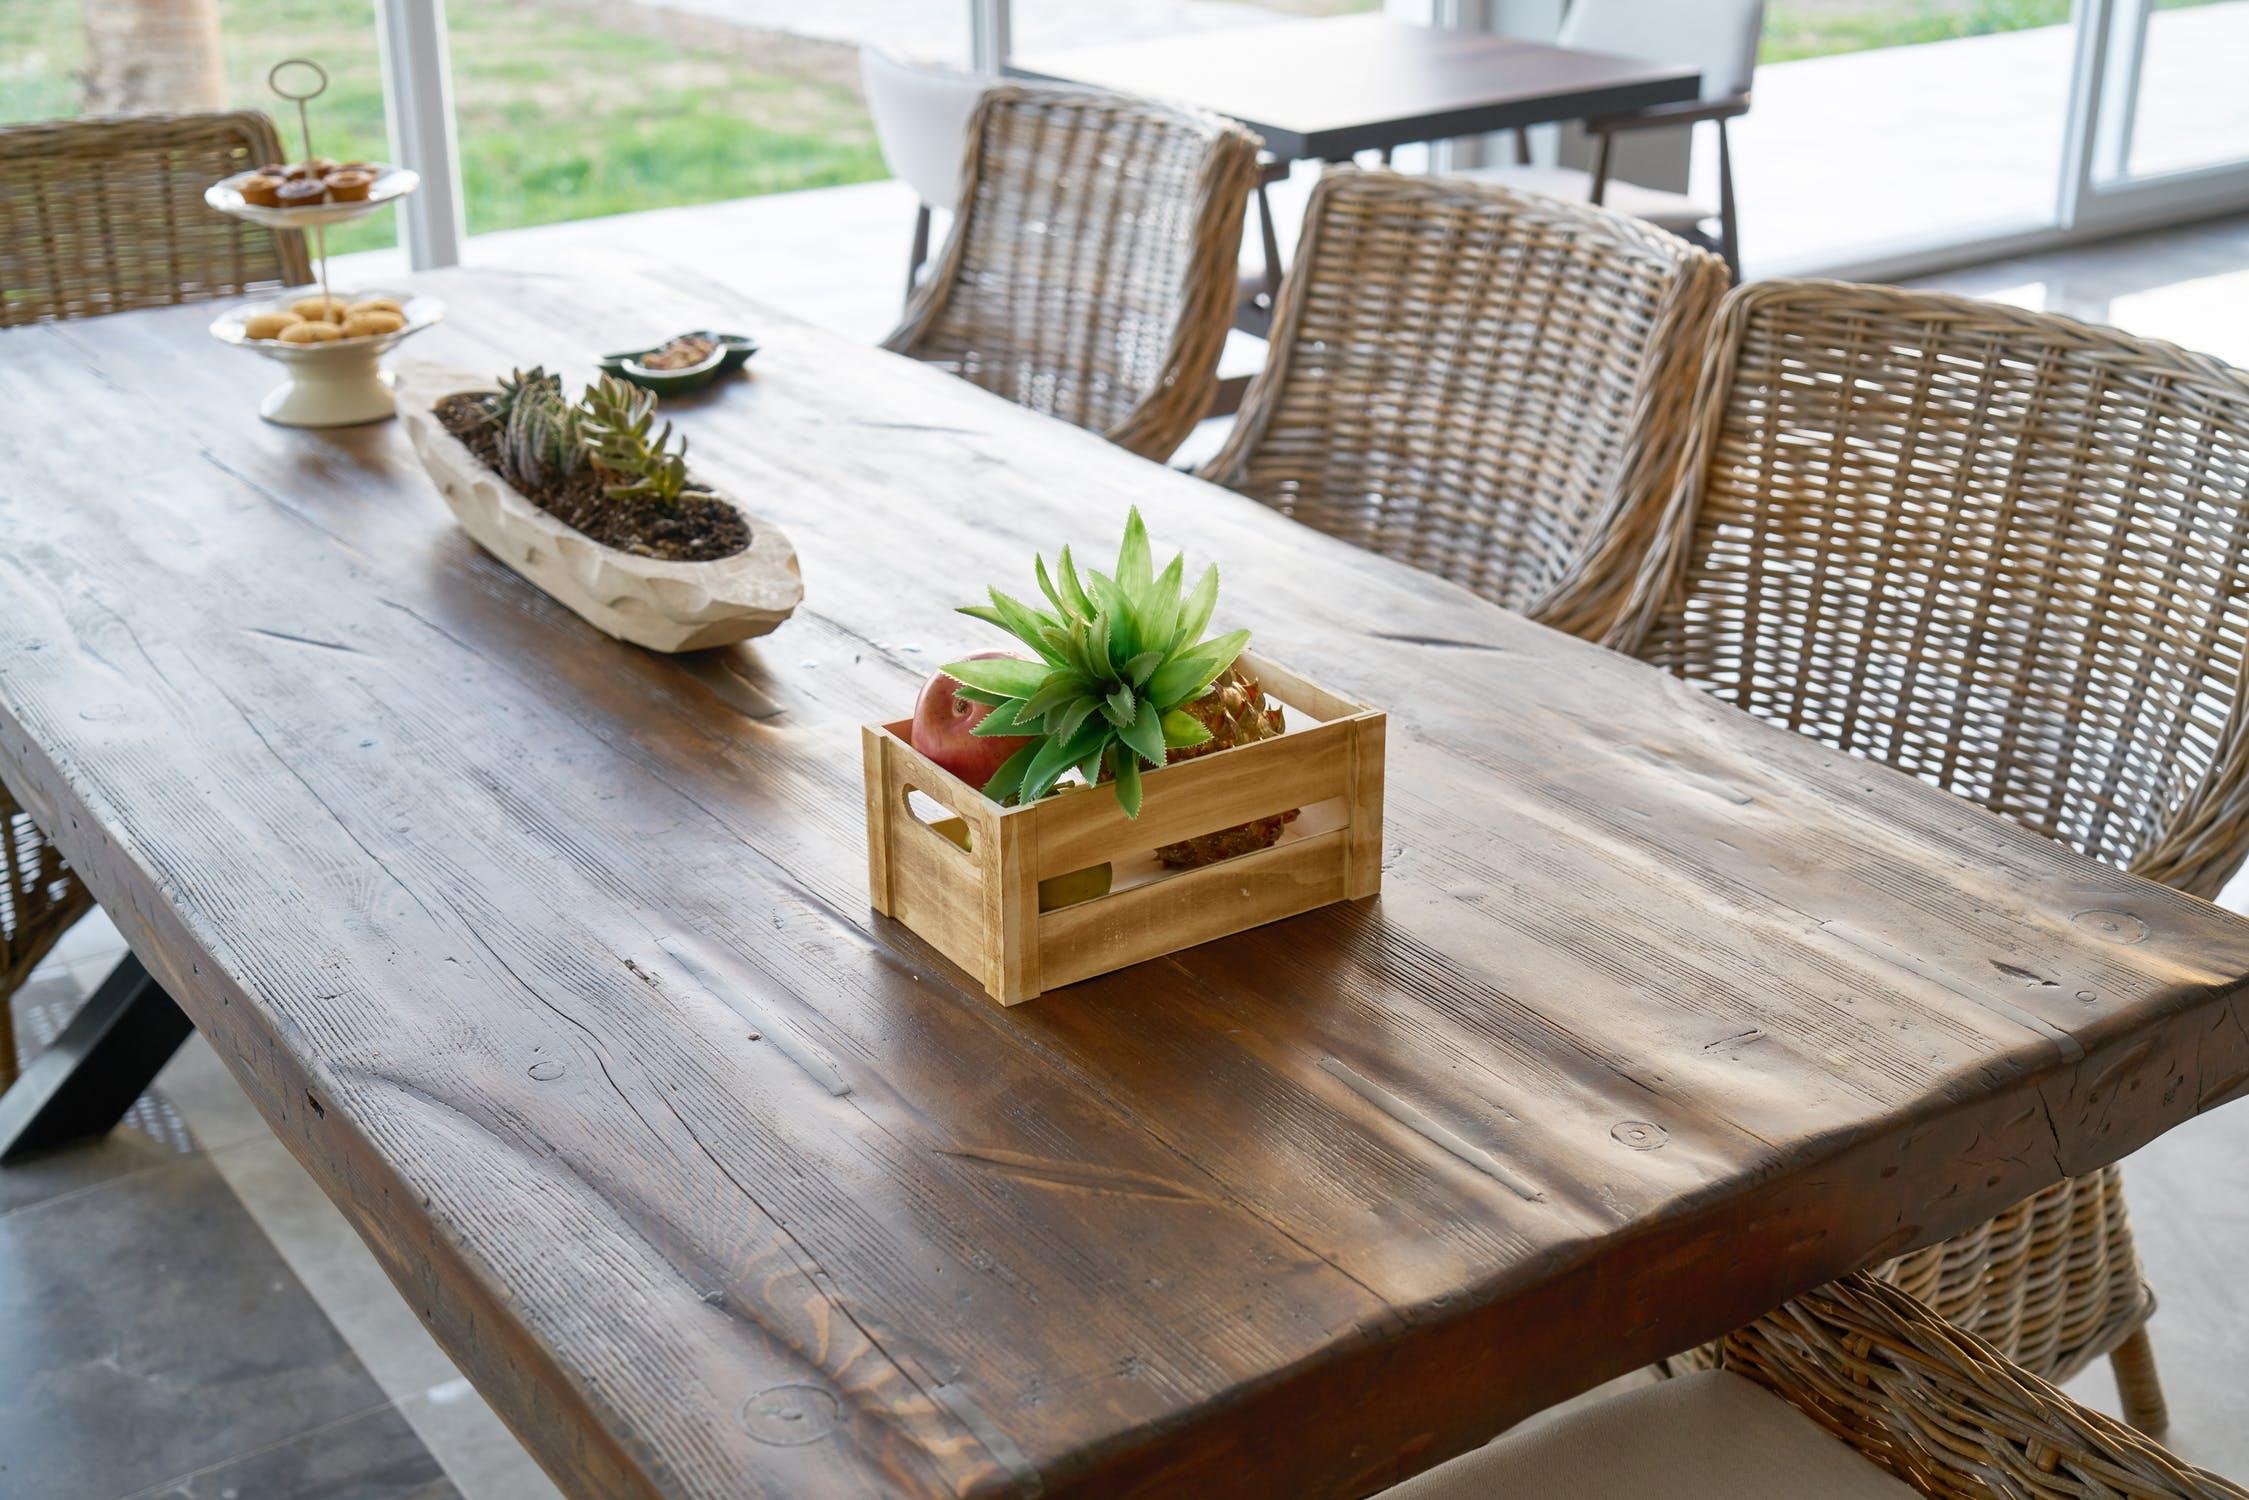 Planke skrivebord i stuen